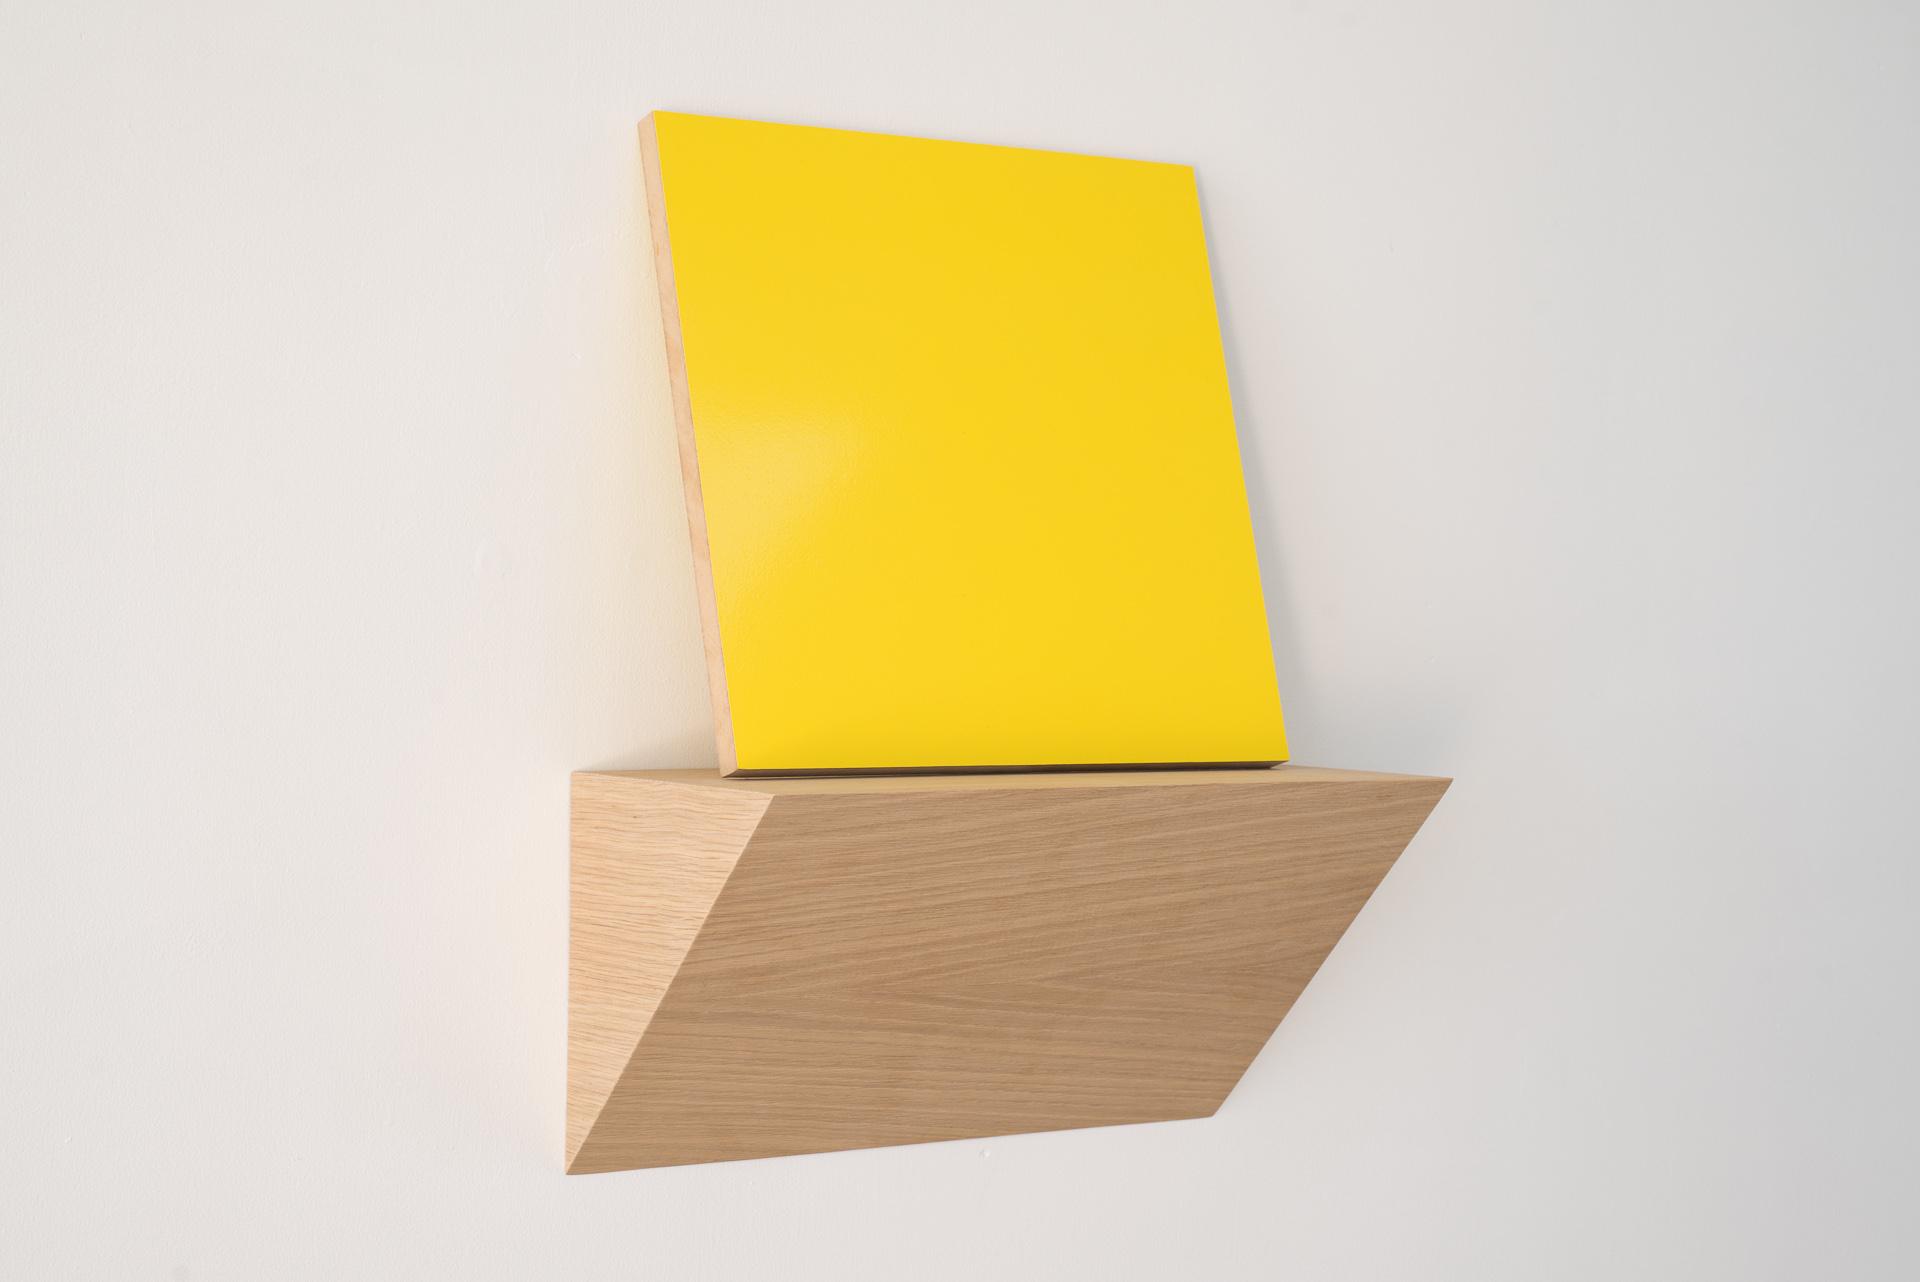 Matt Henry, Untitled A (2015), Urethane paint on MDF, oak veneer, plywood, 350 x 350mm